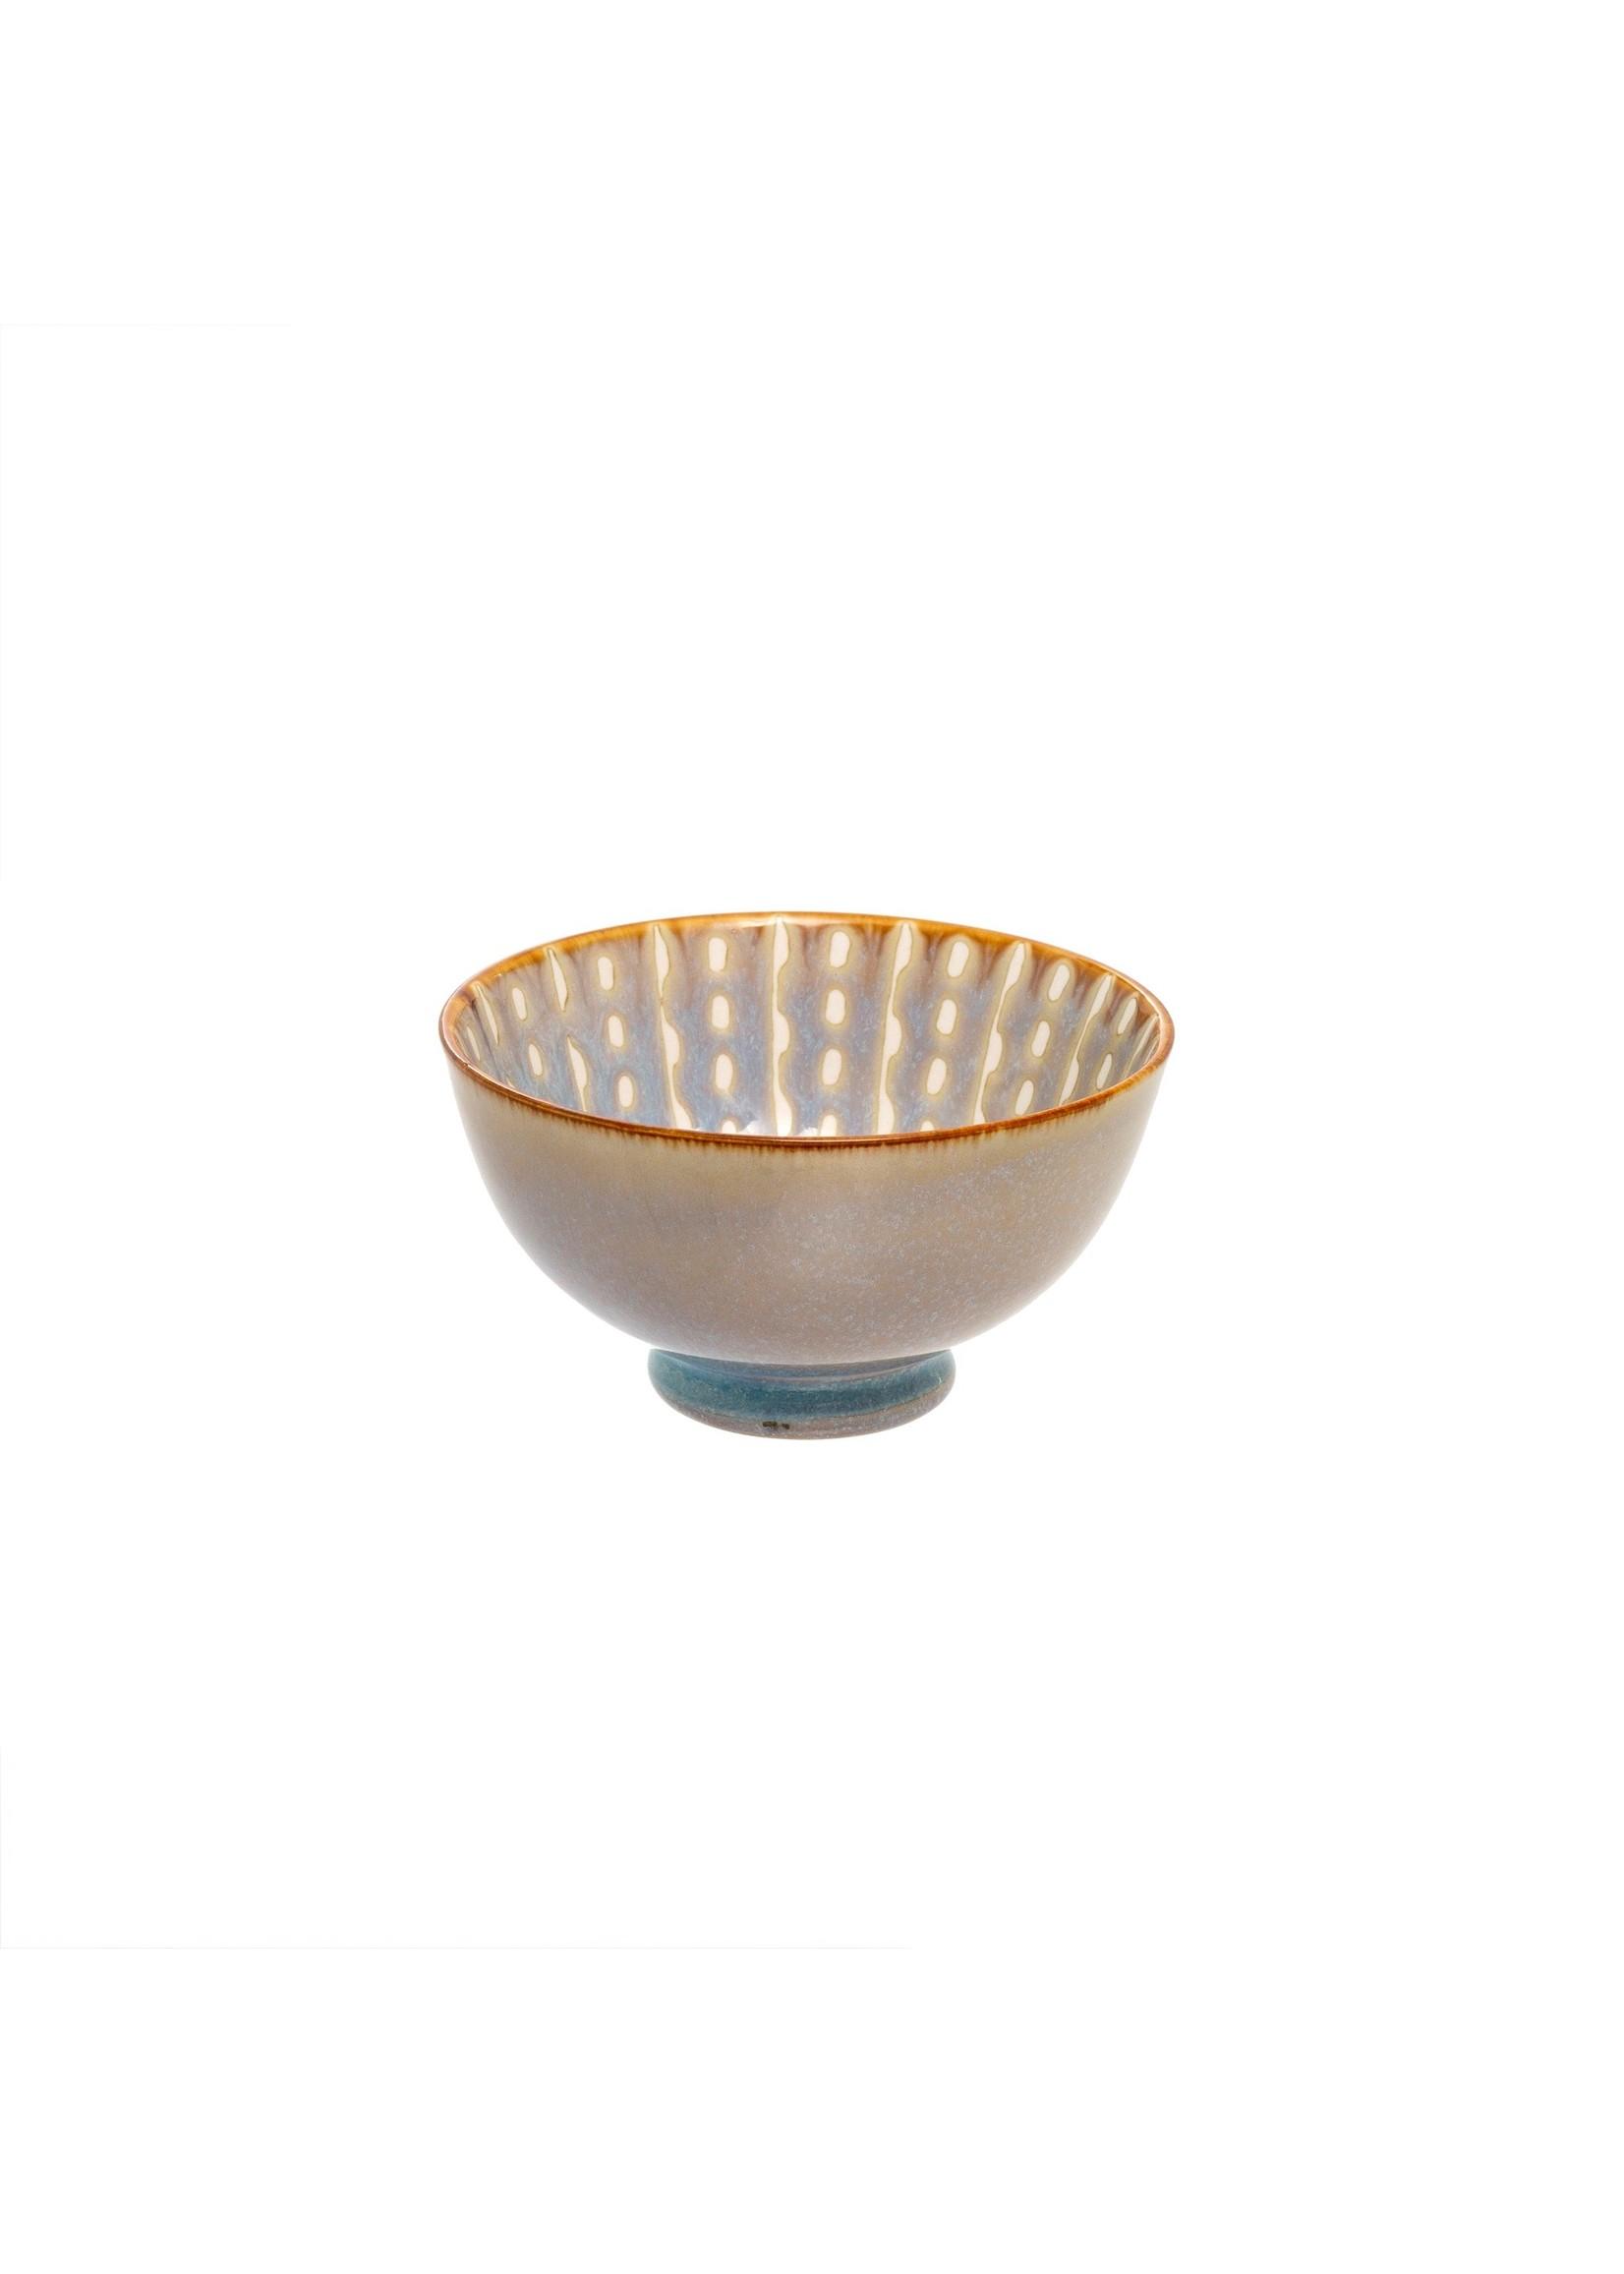 Wisteria Breakfast Bowl